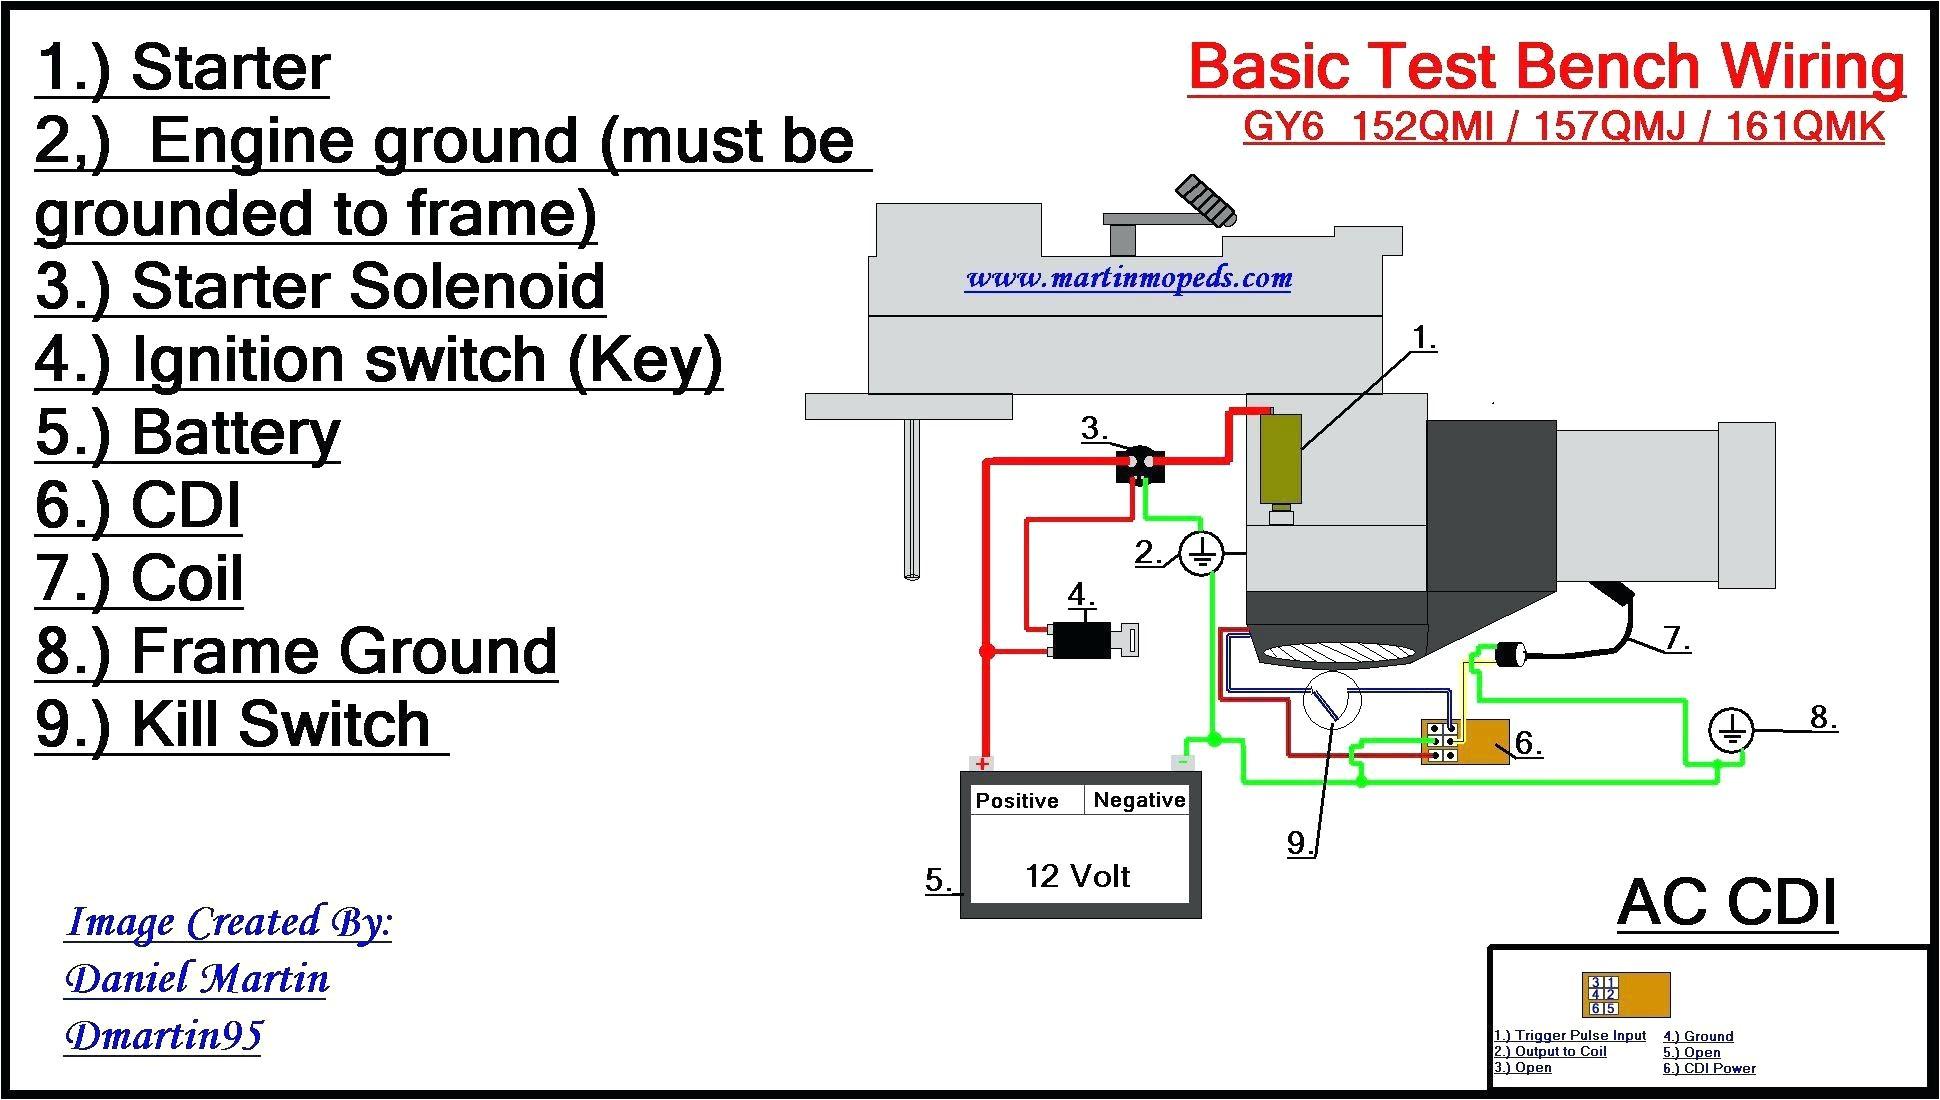 6 wire cdi wiring diagram wiring diagram for 6 pin relay new 5 pin cdi box wiring diagram new of 6 wire cdi wiring diagram jpg